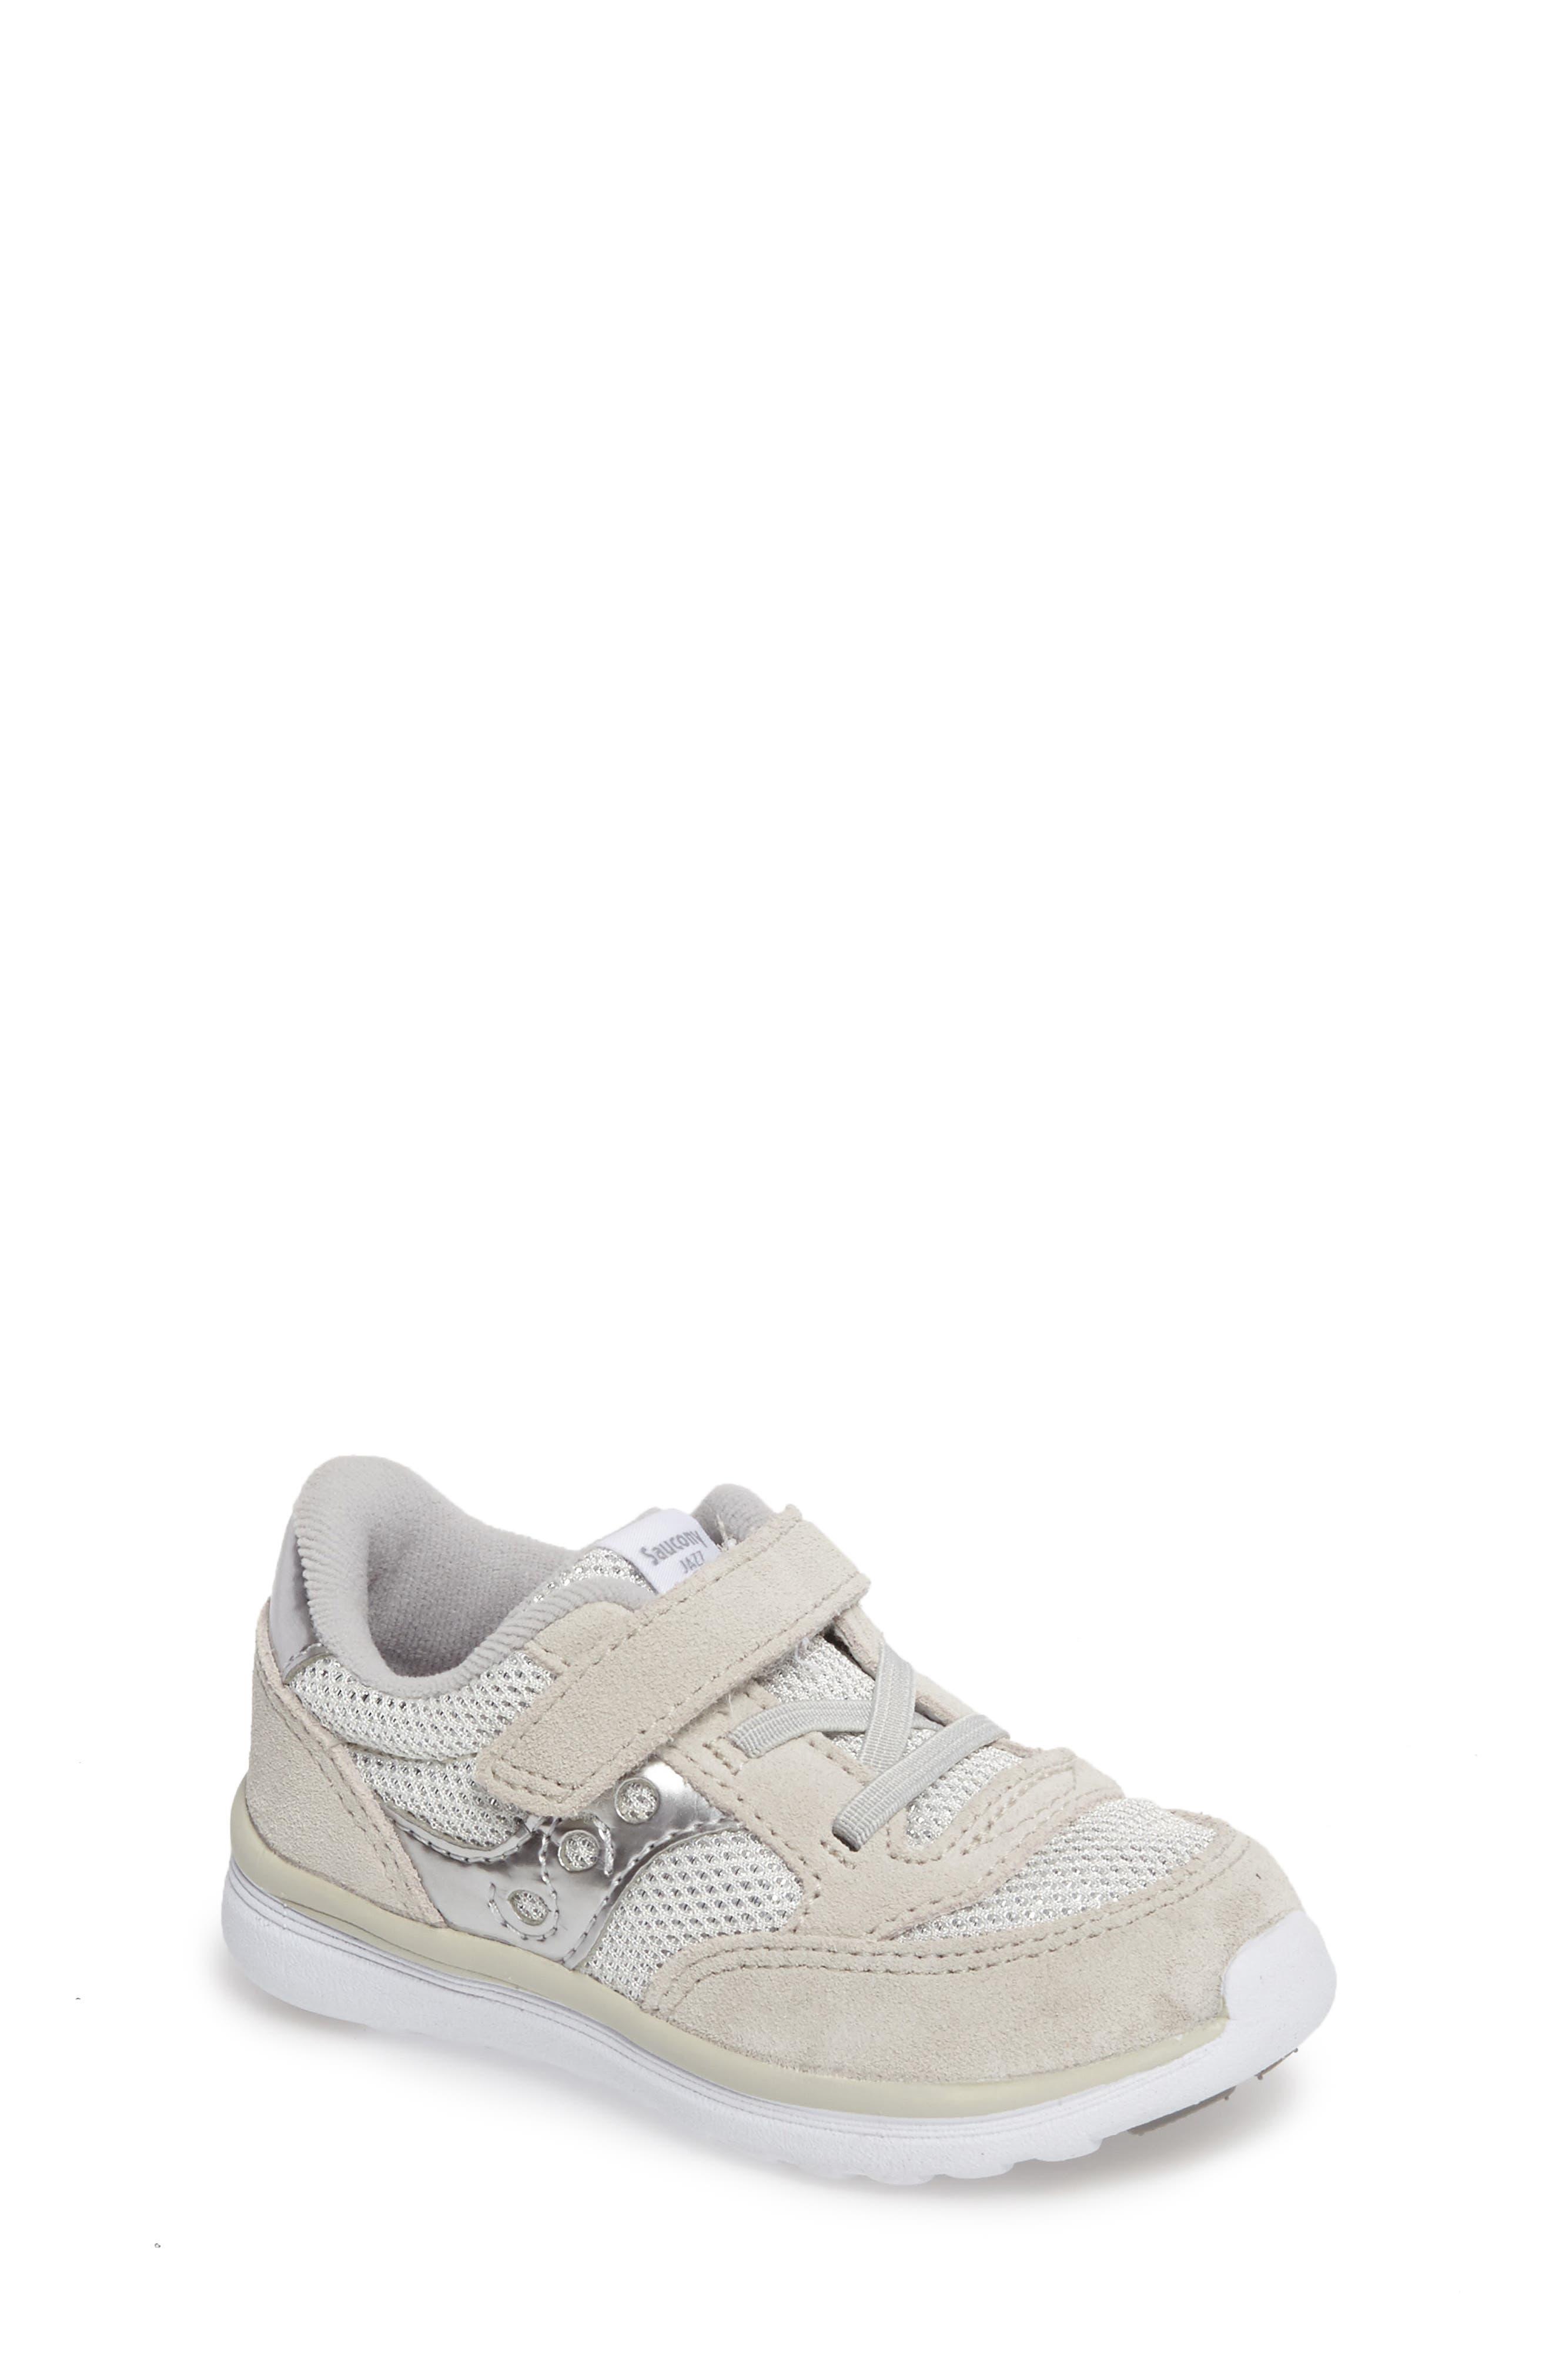 Jazz Lite Sneaker,                         Main,                         color, 040